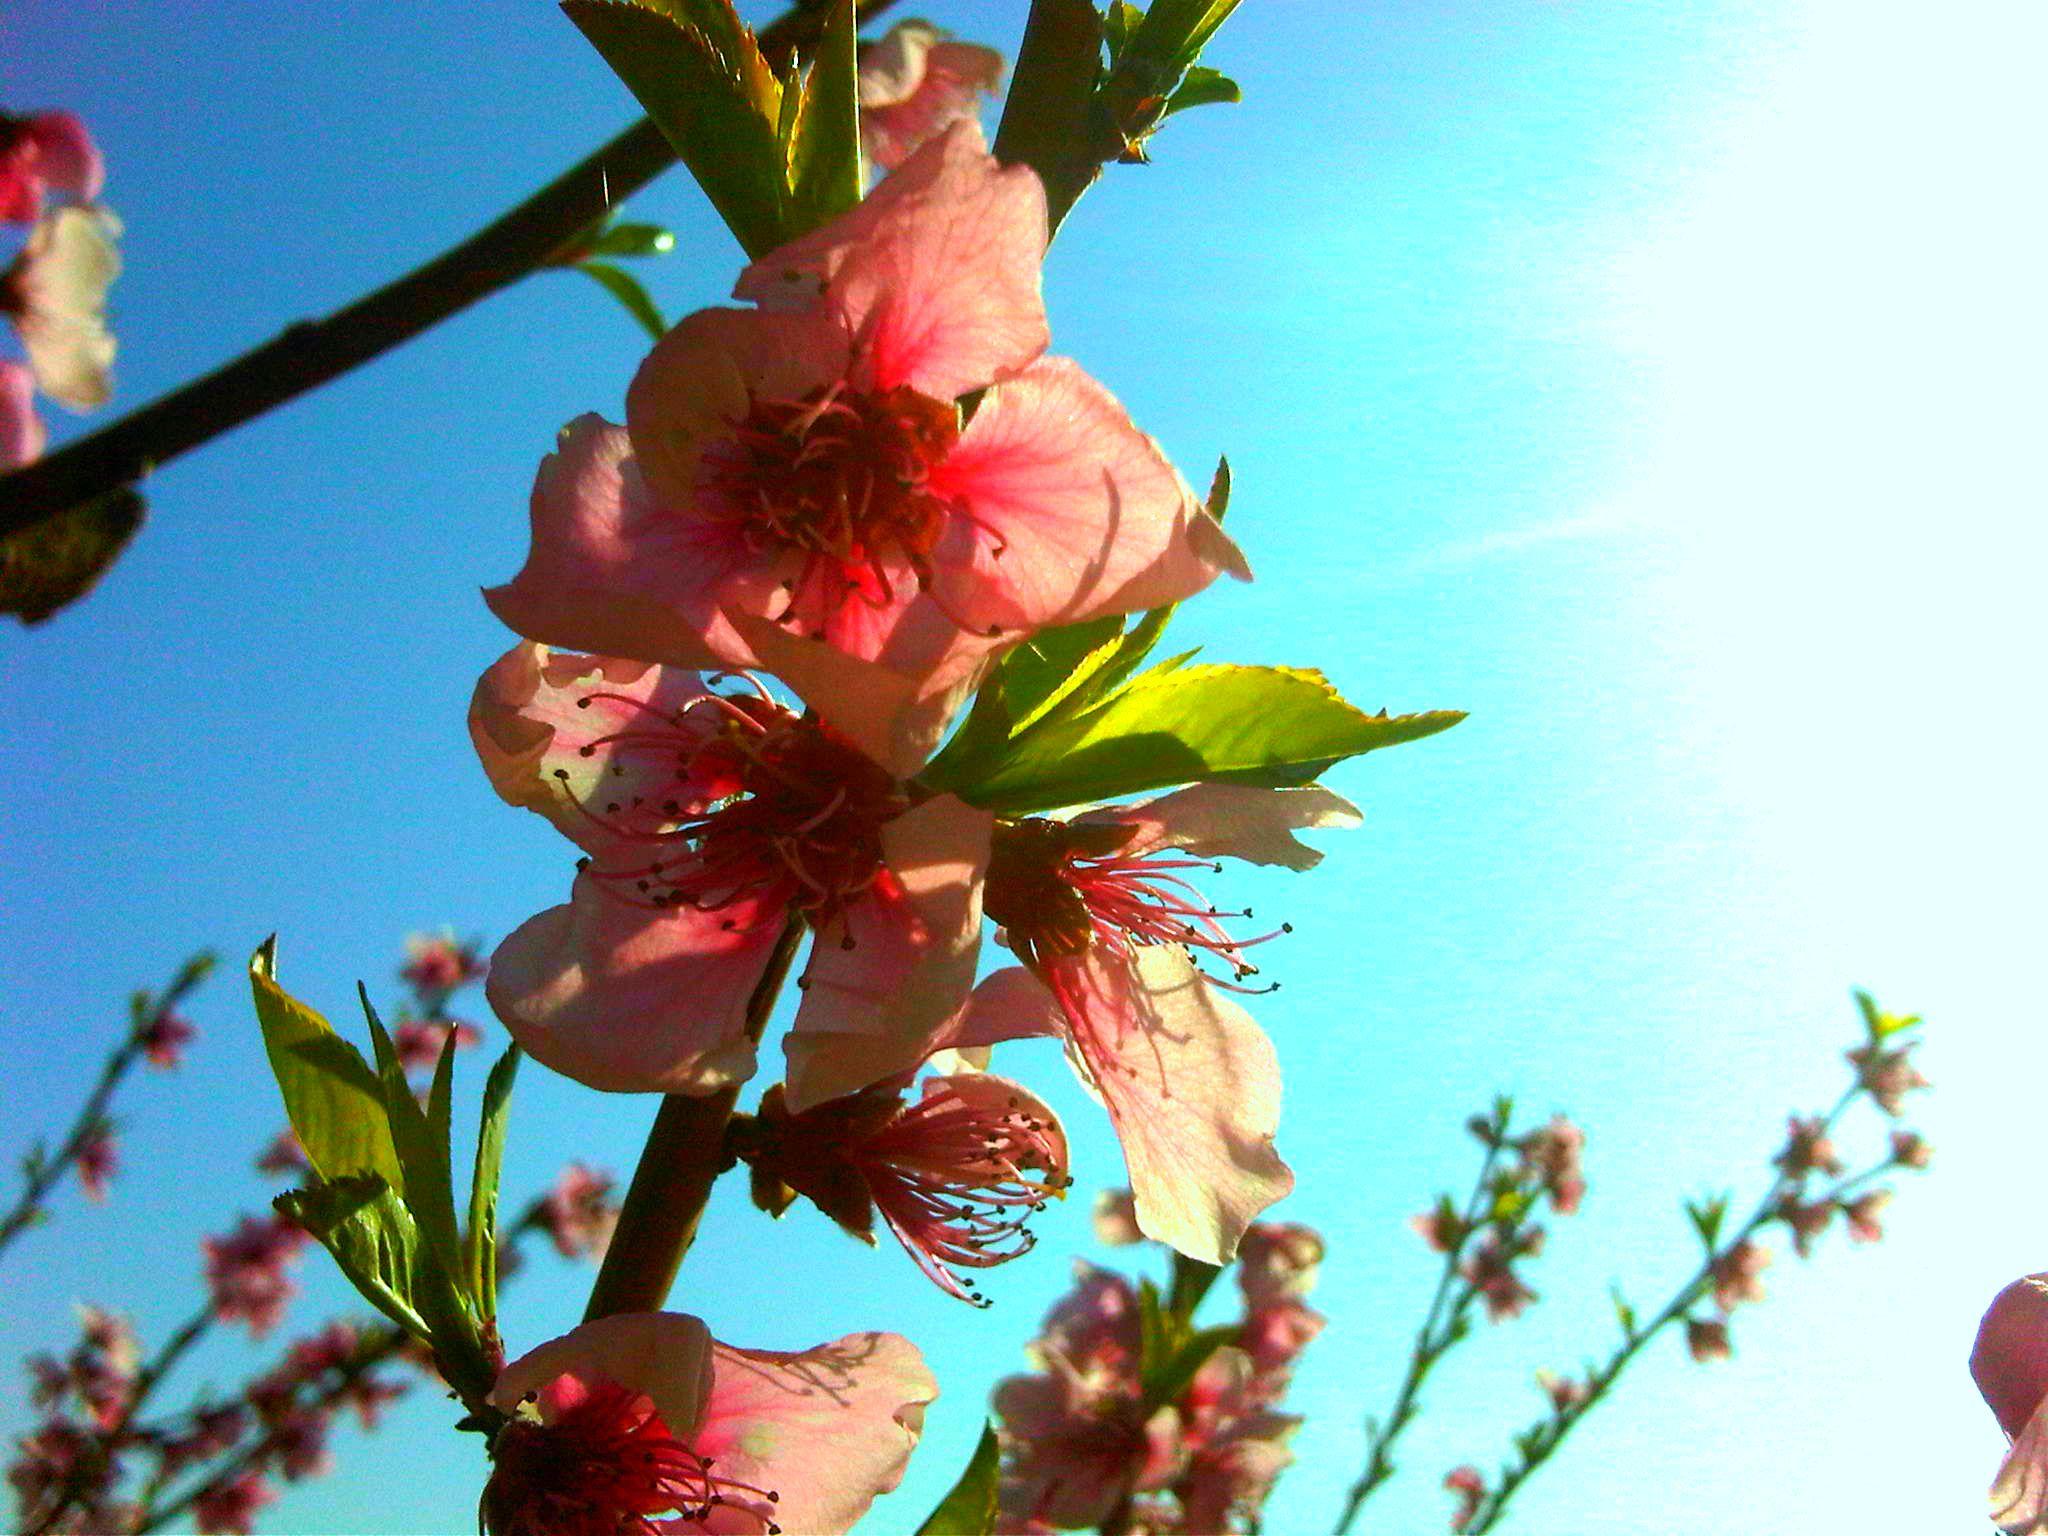 Peach tree 03.2012 Muggia, Italy